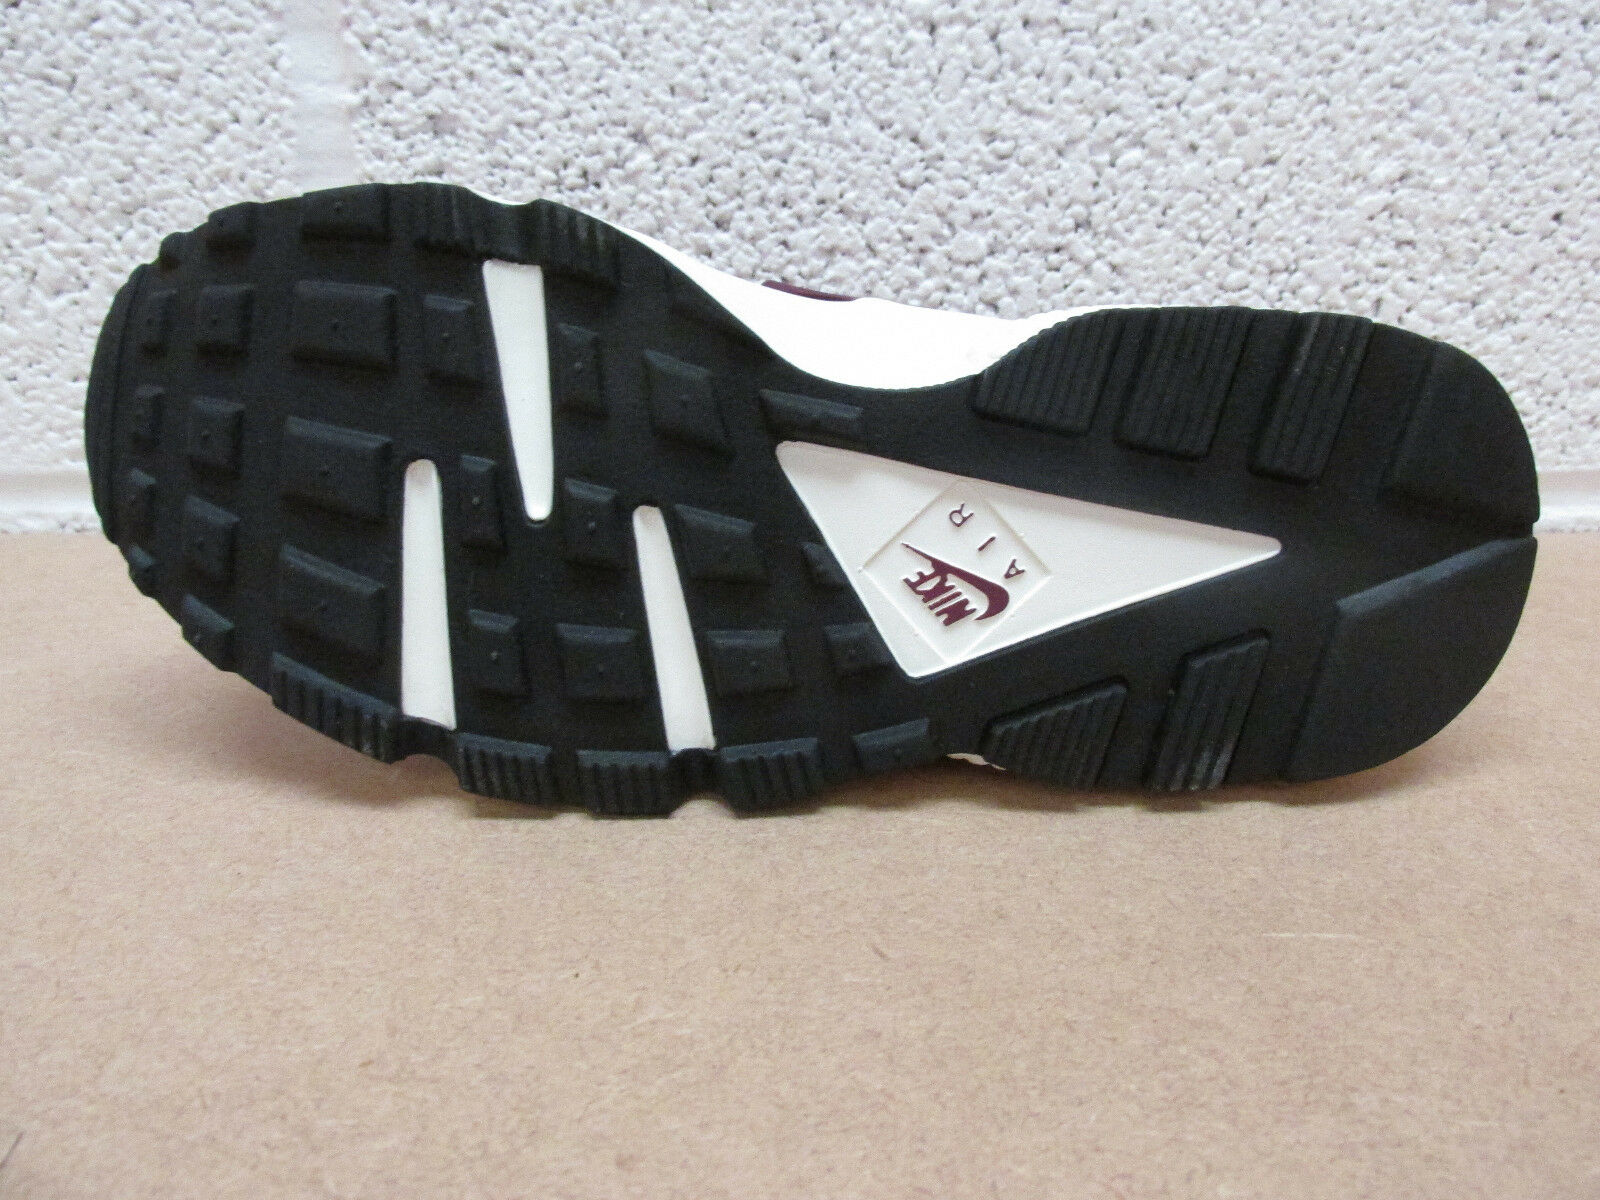 Nike femme print air huarache run print femme running baskets 725076 500 baskets chaussures 3b14a5